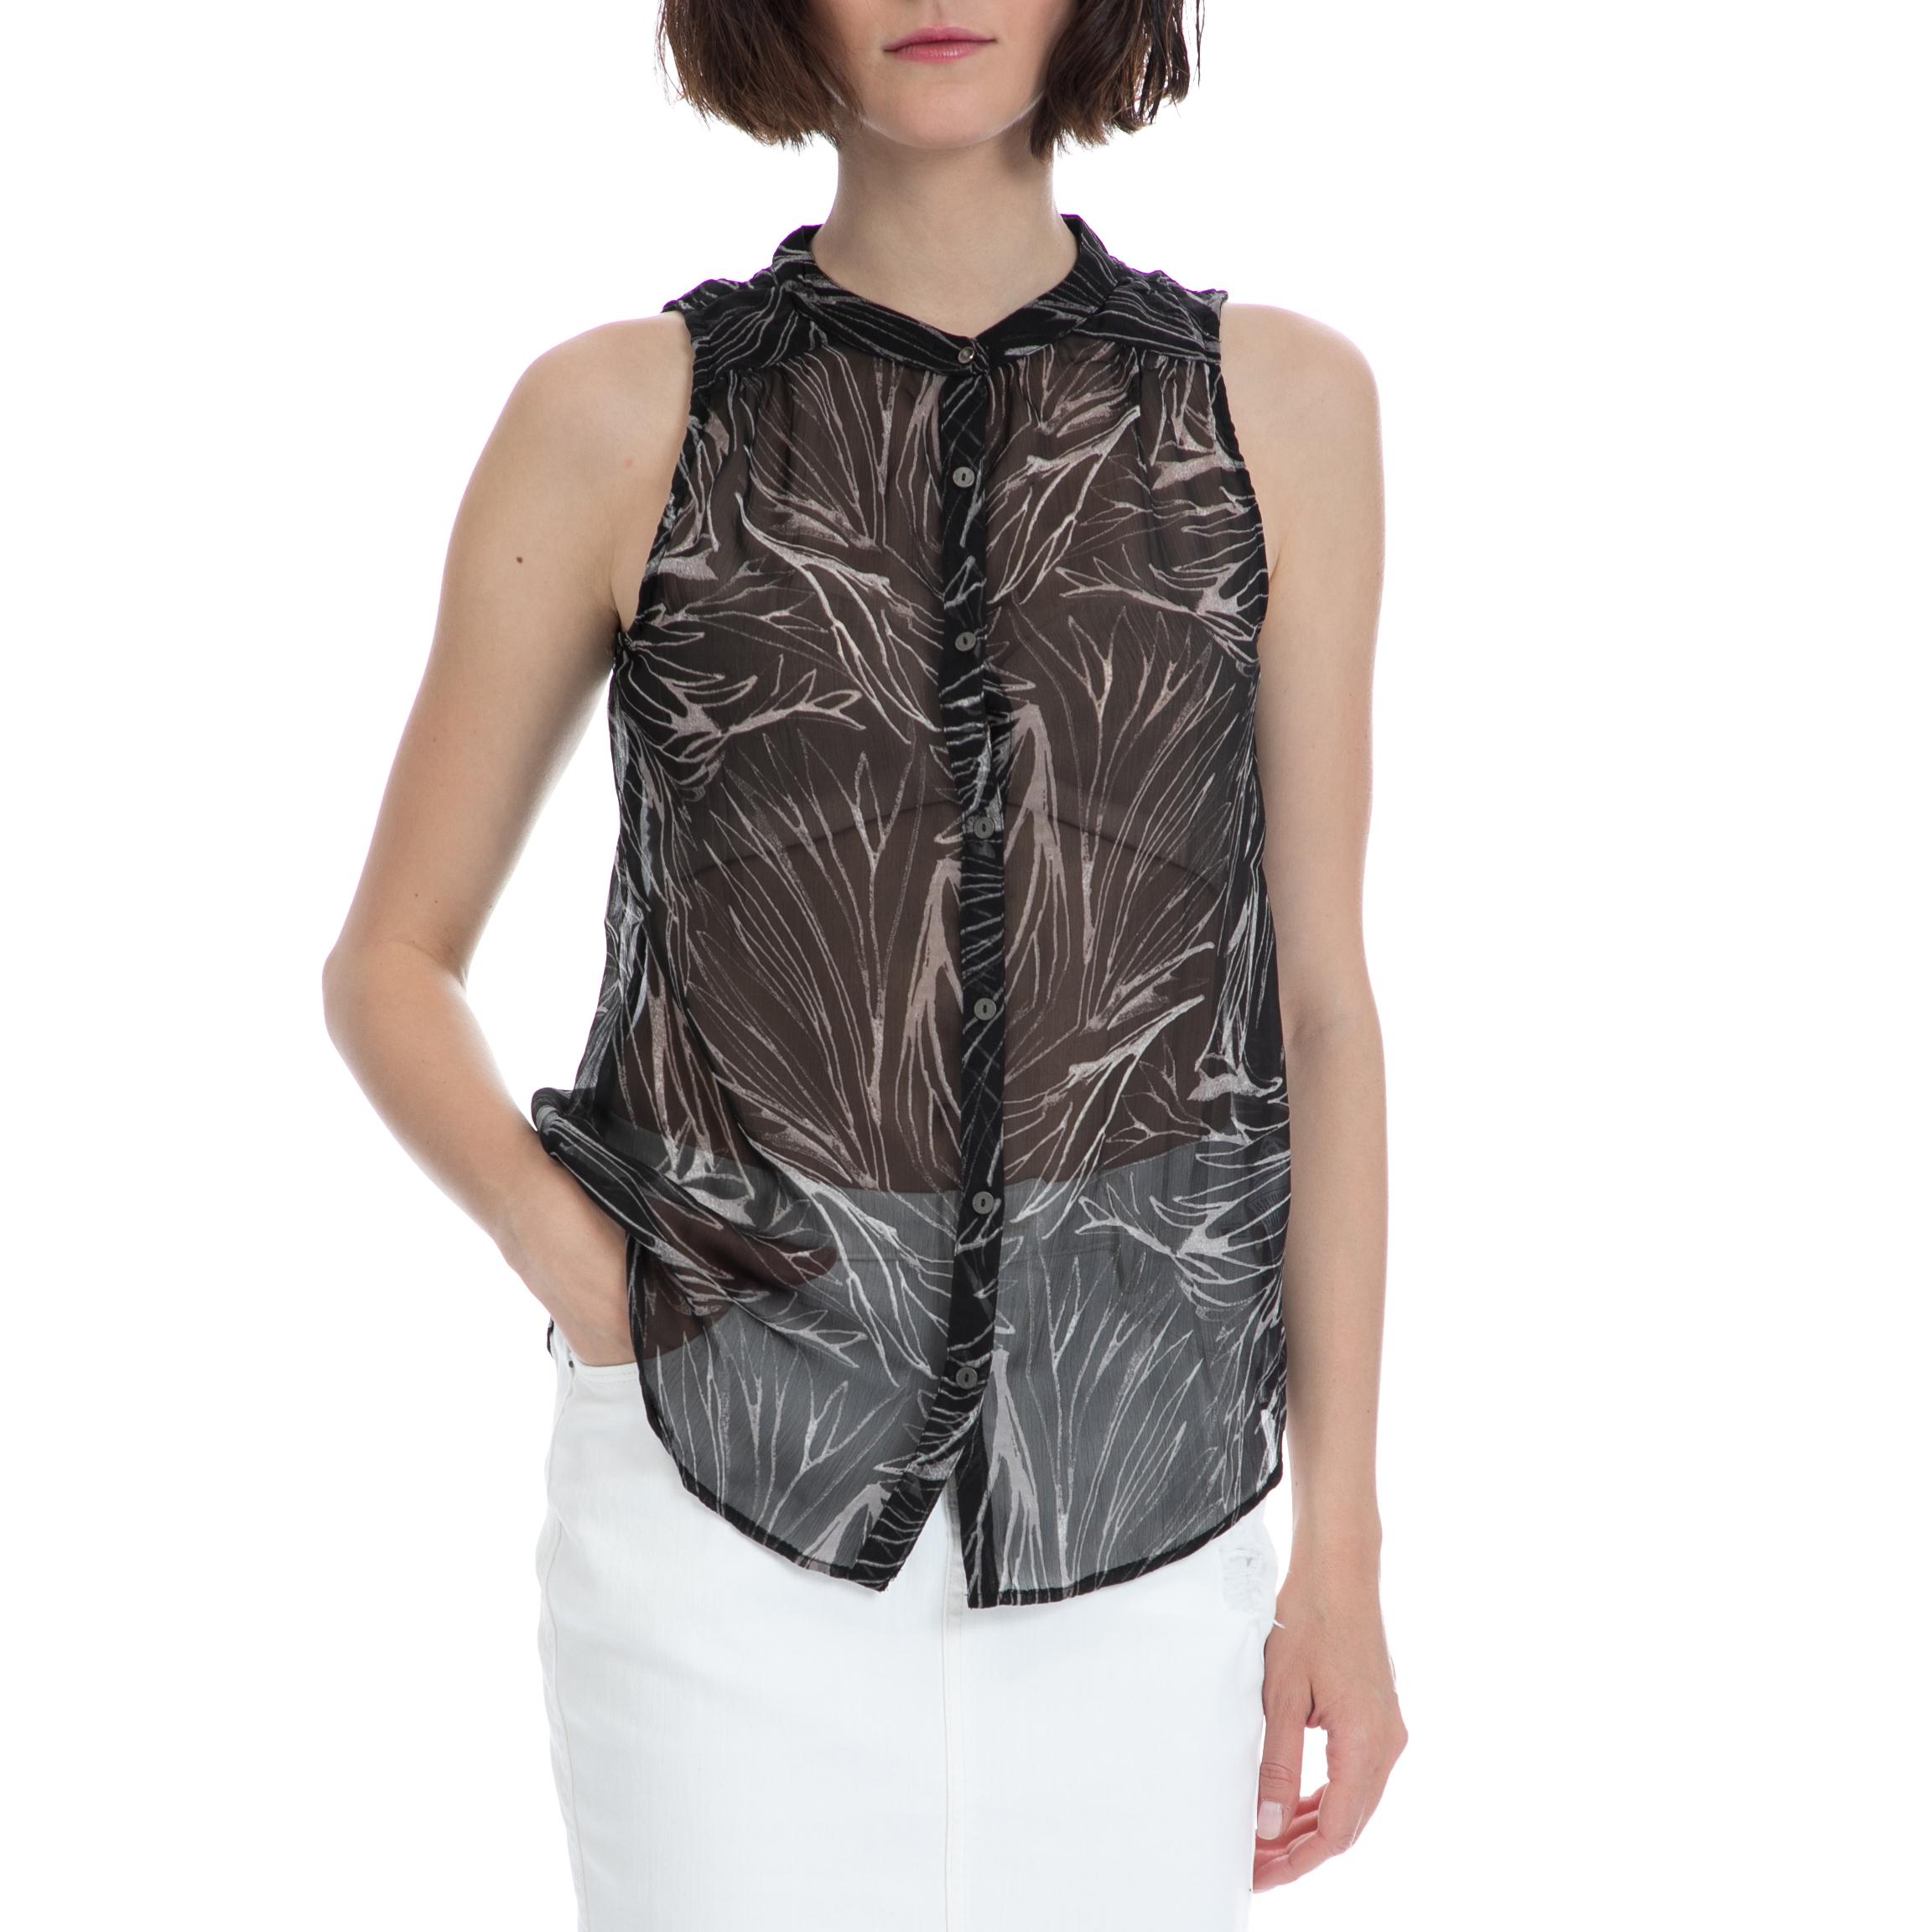 GARCIA JEANS - Γυναικείο πουκάμισο Garcia Jeans μαύρο γυναικεία ρούχα πουκάμισα κοντομάνικα αμάνικα